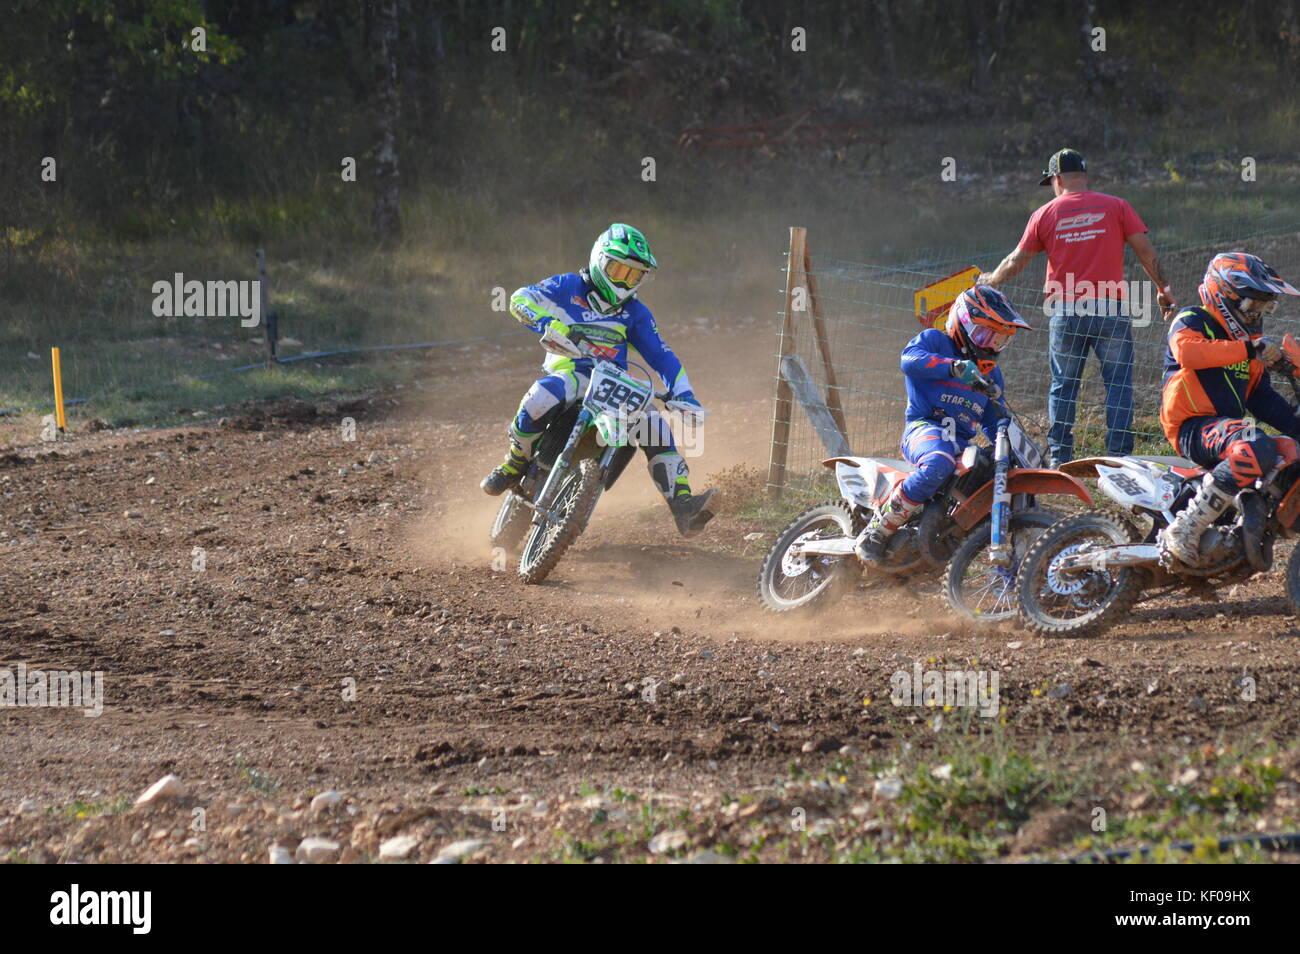 A Motocross race in Saint Christol 23 at 24 september 2017 (south of france) - Stock Image